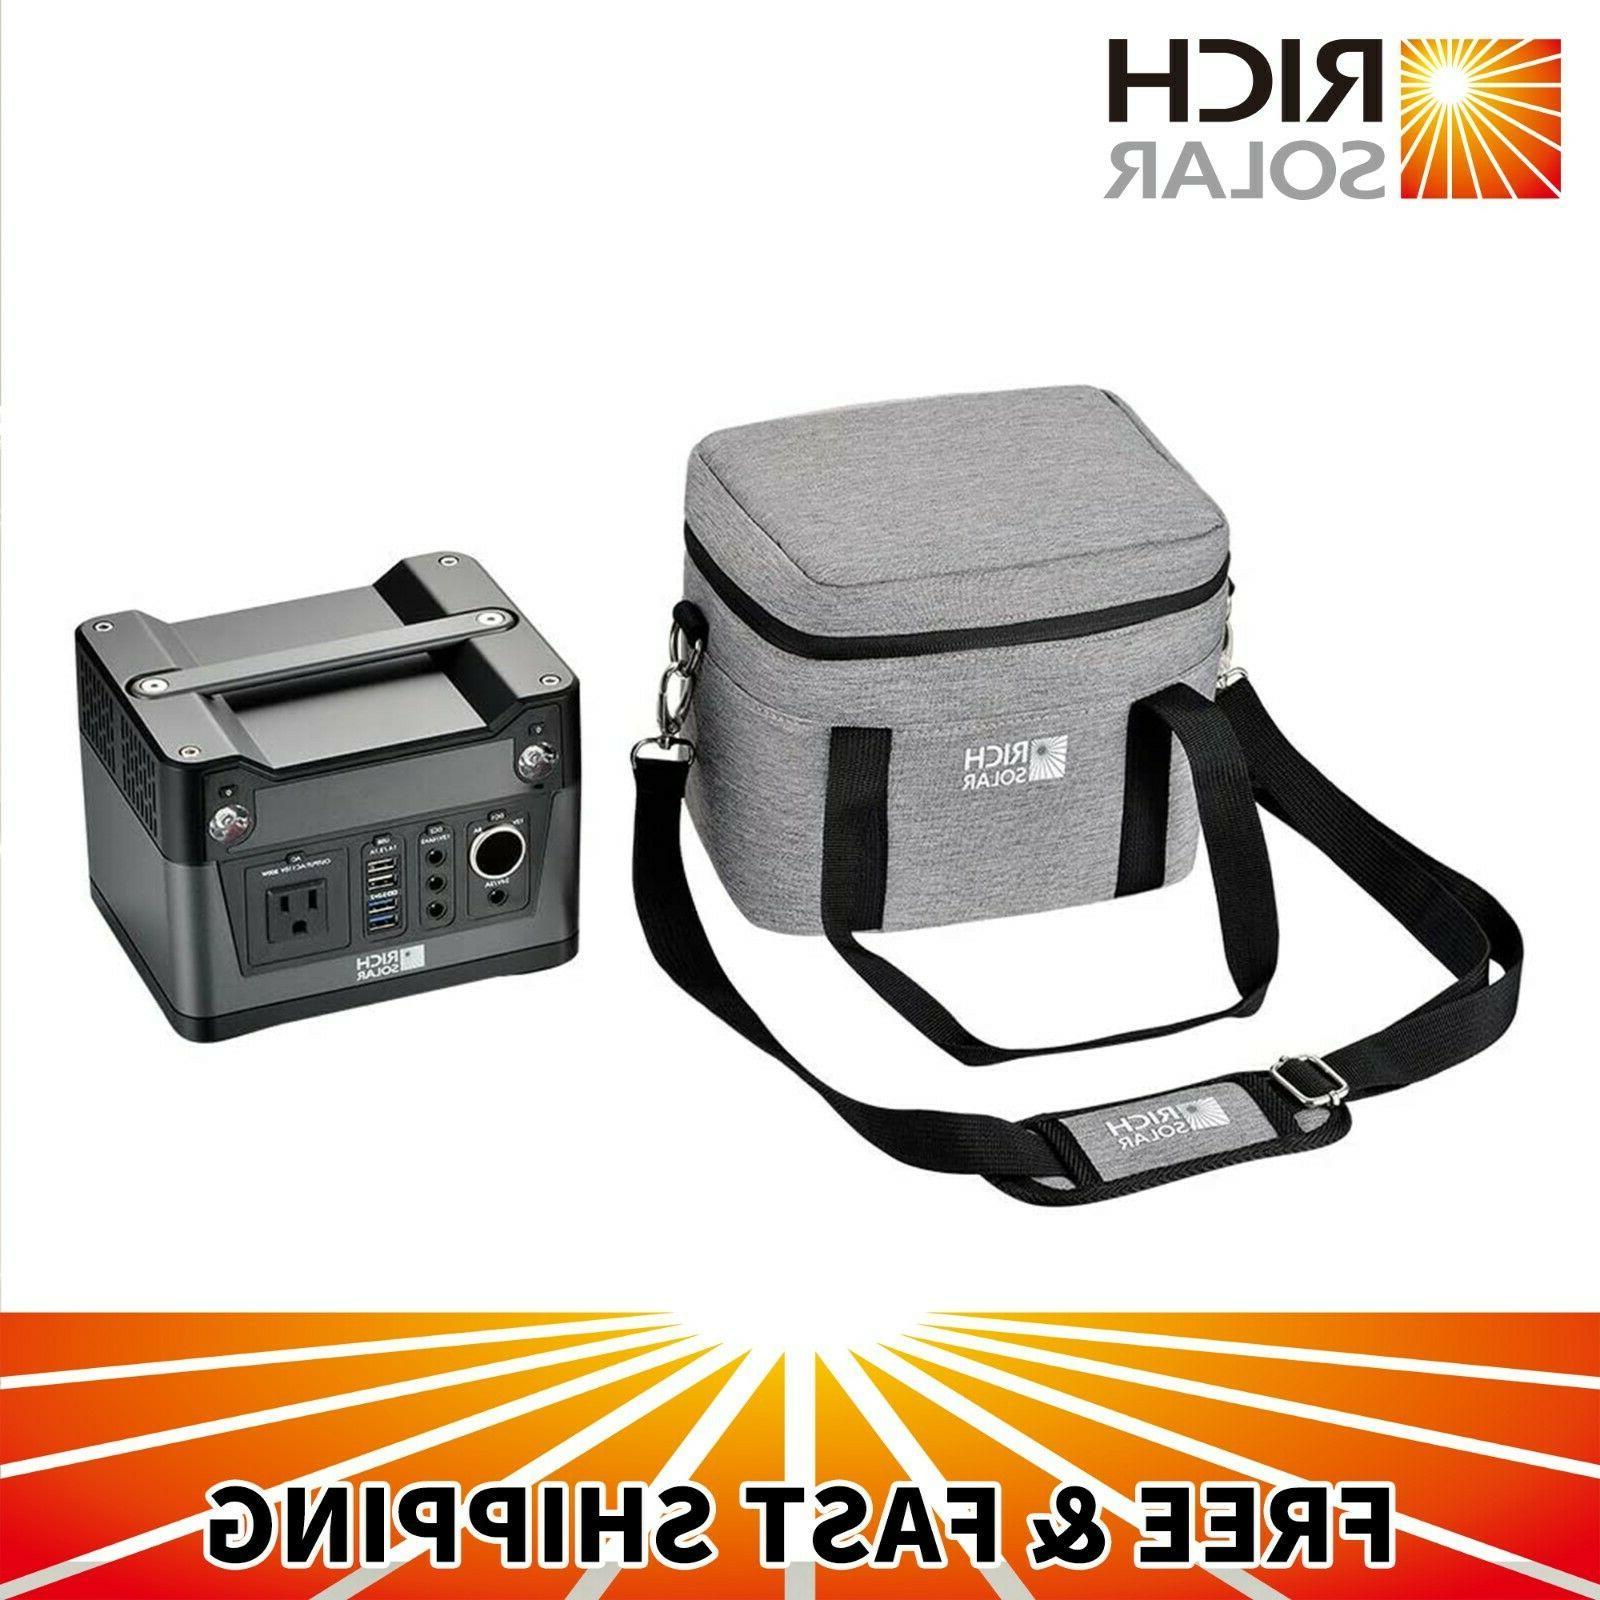 300w portable generator lithium portable power station